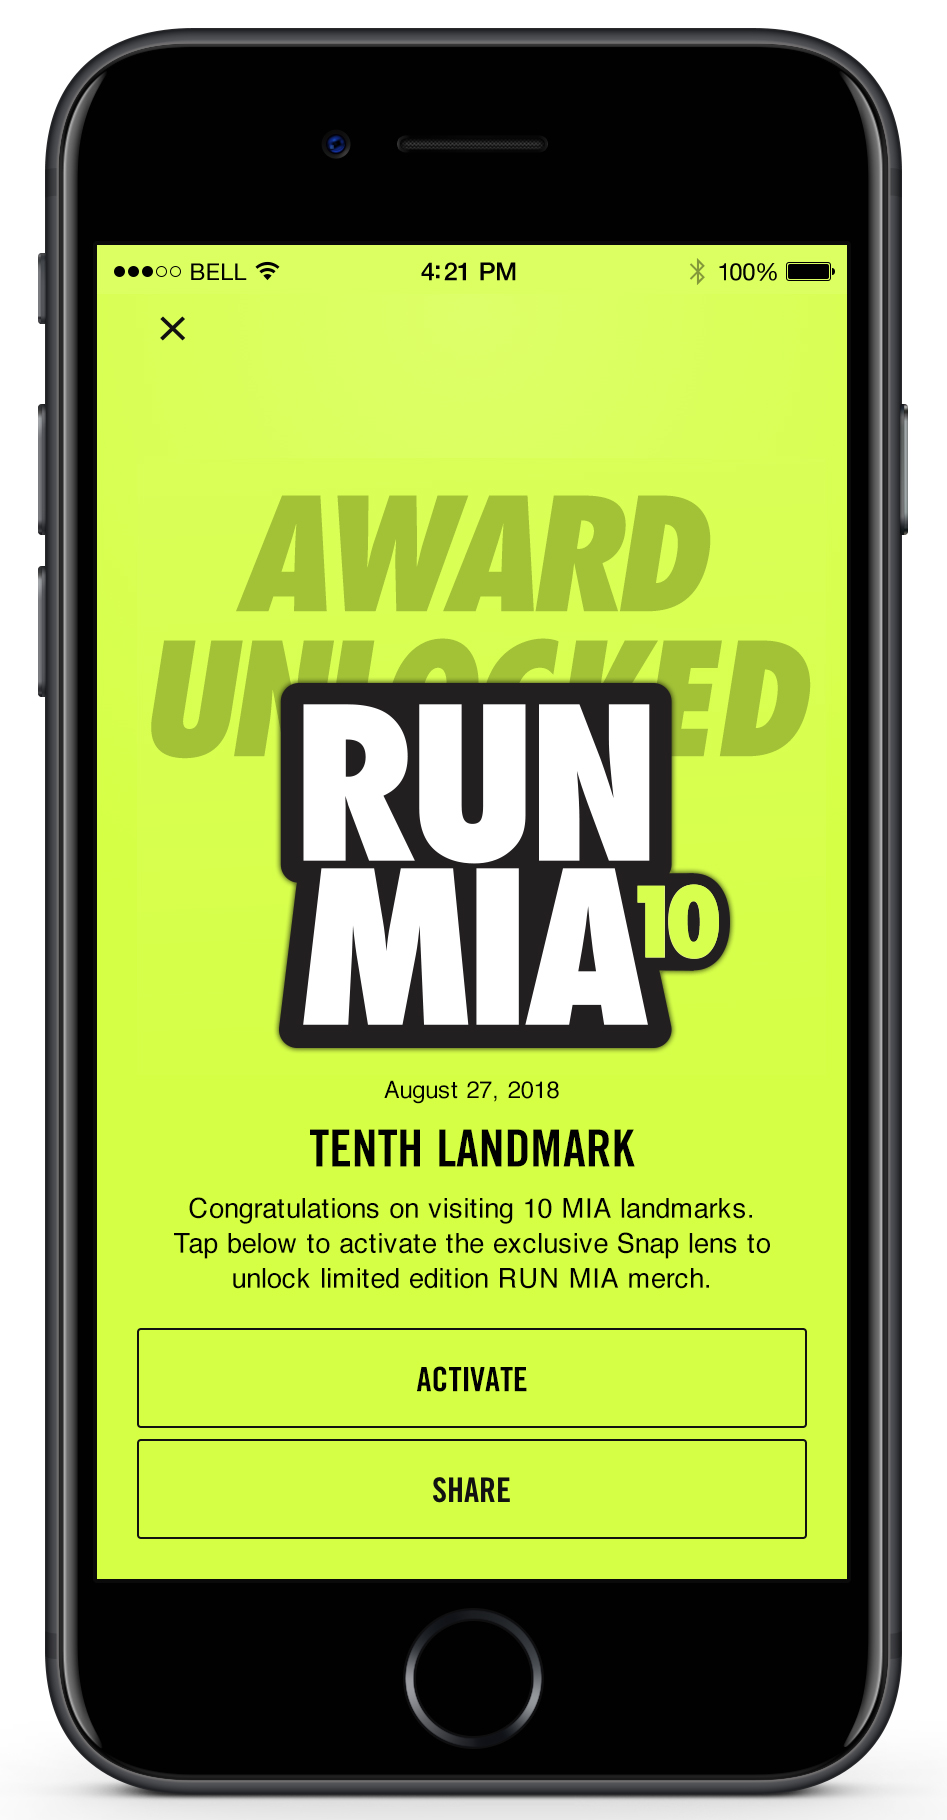 RUN_MIA_Unlock.jpg